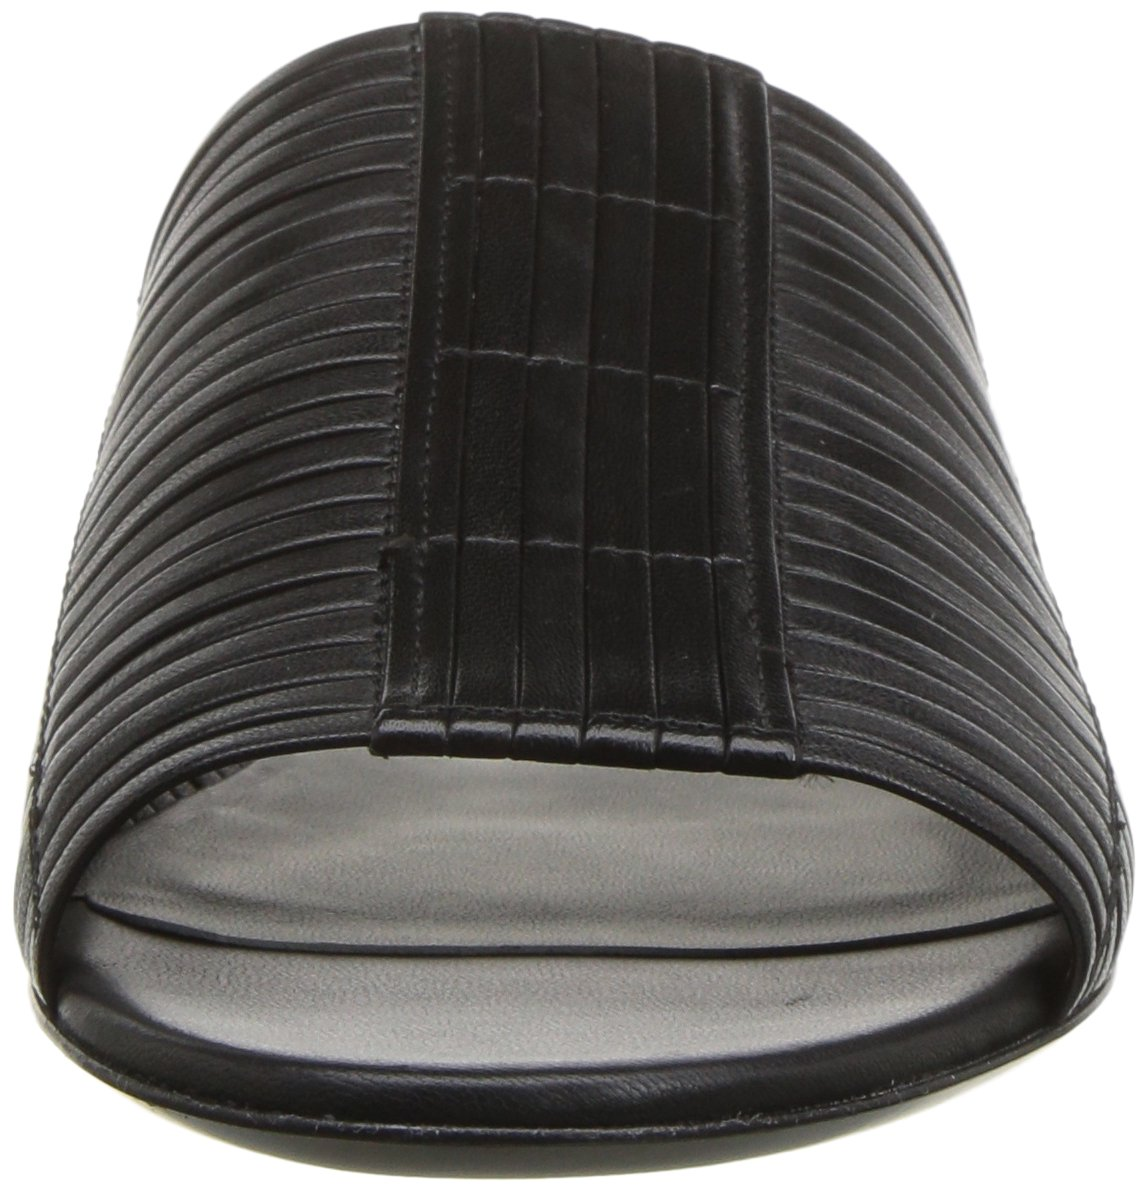 Via Spiga Women's Harlotte Woven Slide Sandal B0752XQRYD 9.5 B(M) US|Black Leather